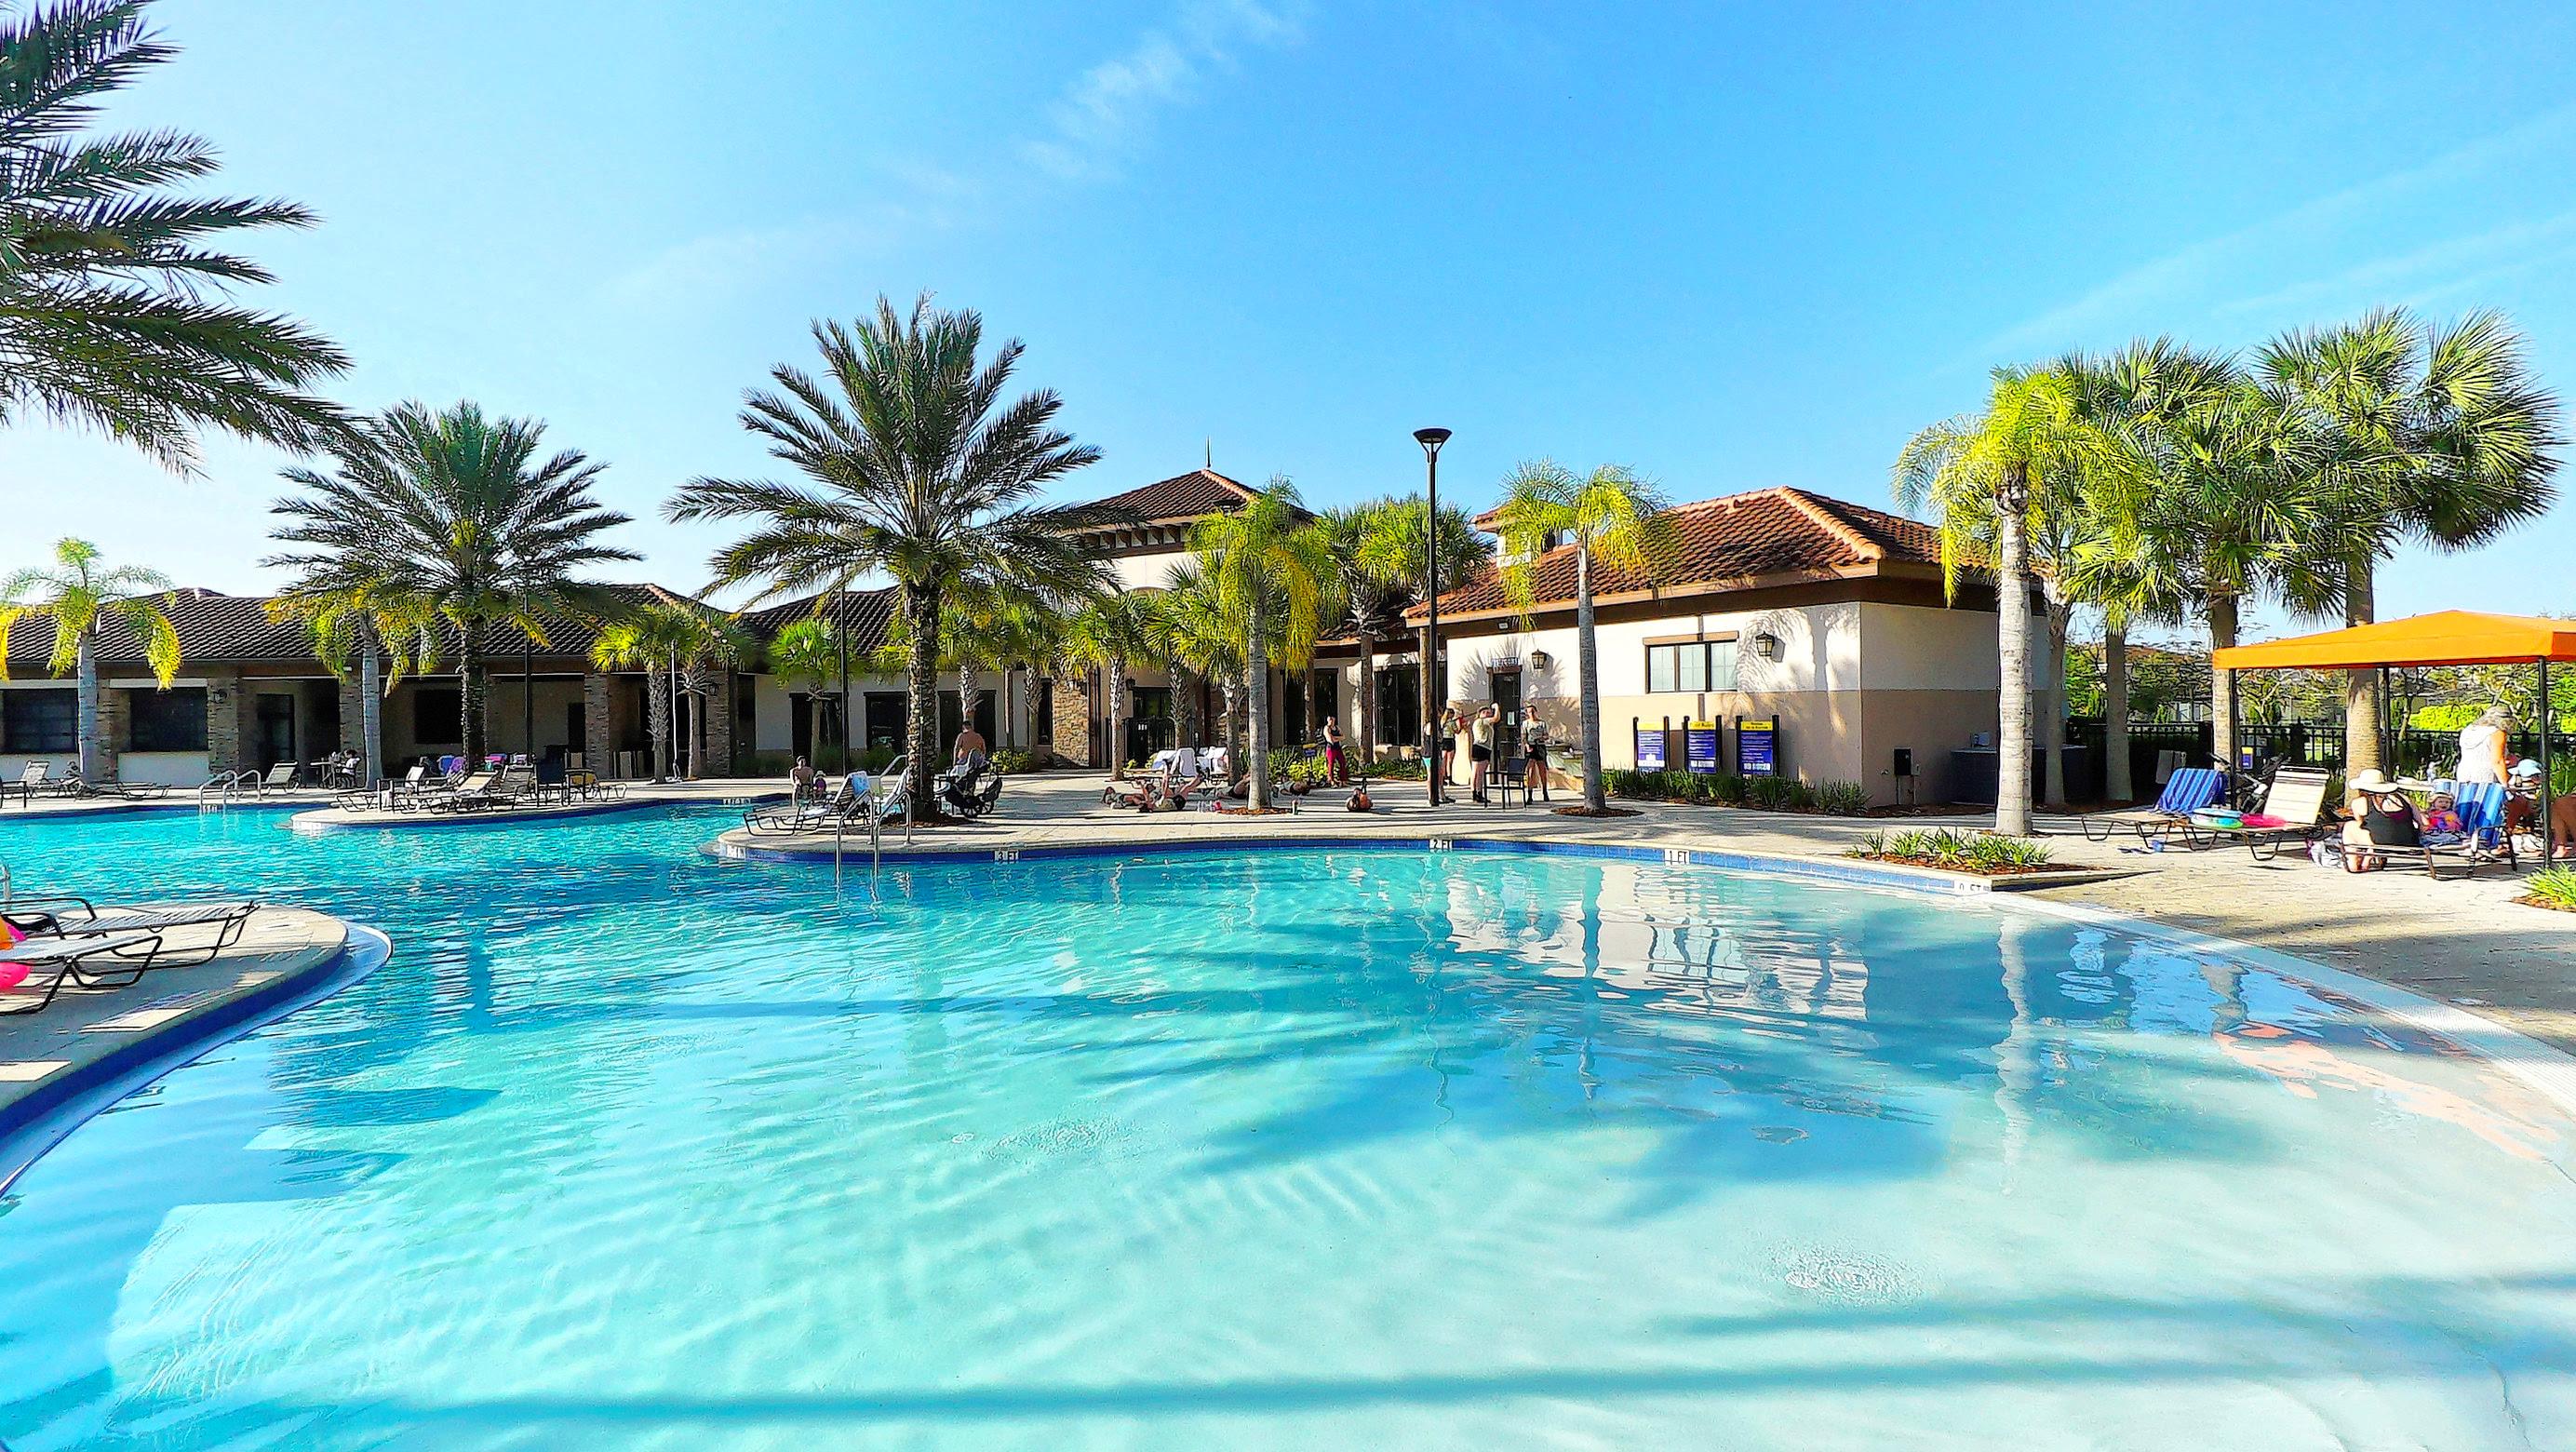 New Homes in Solterra Resort  Davenport Florida  DR